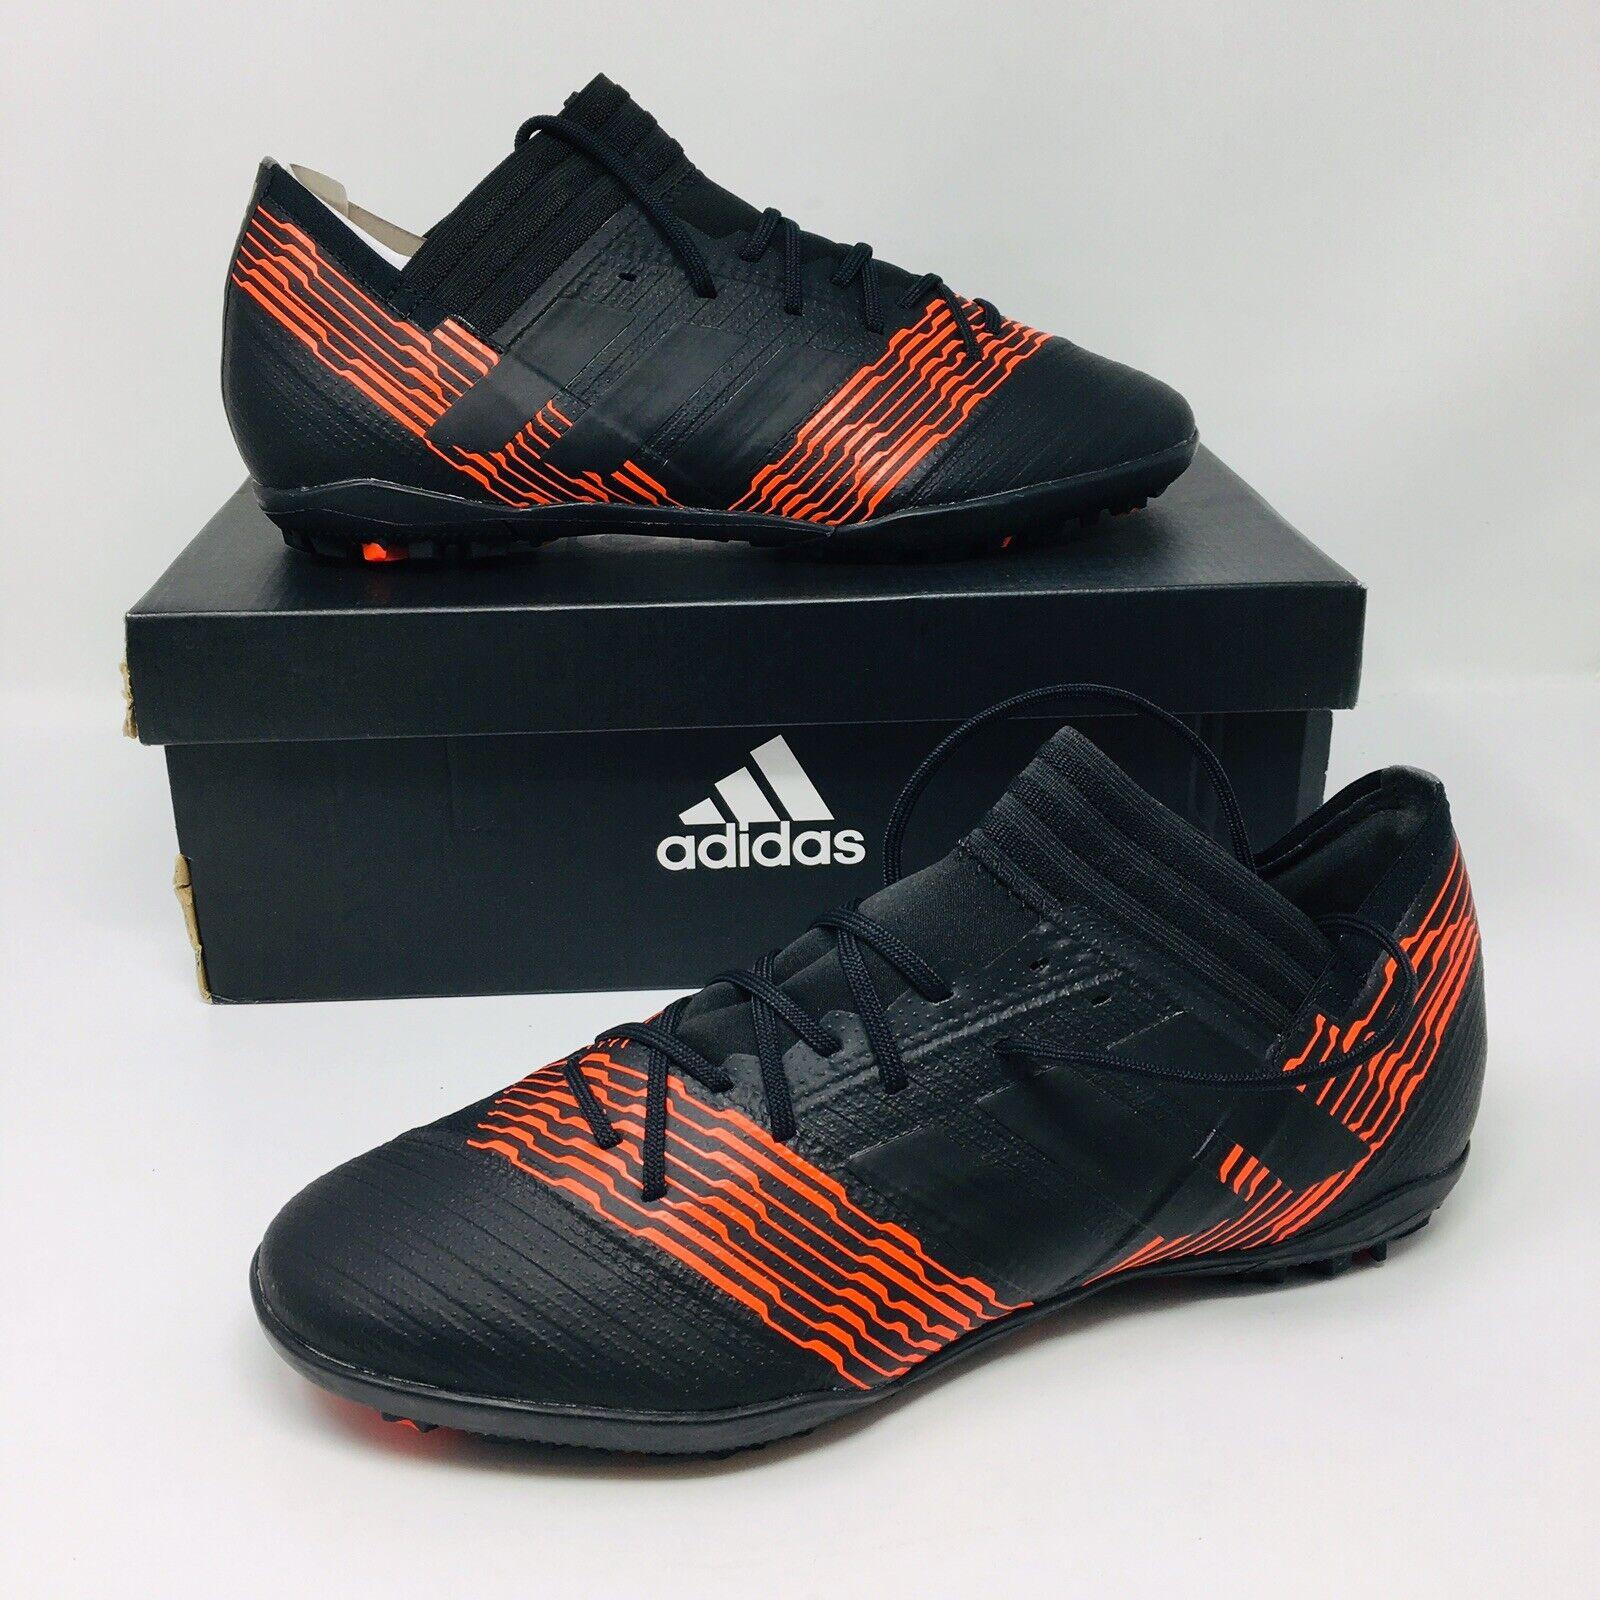 NEW Adidas Adidas Adidas Nemeziz Tango 17.3 TF (Men Size 9) Black Soccer shoes Cleats f3187f